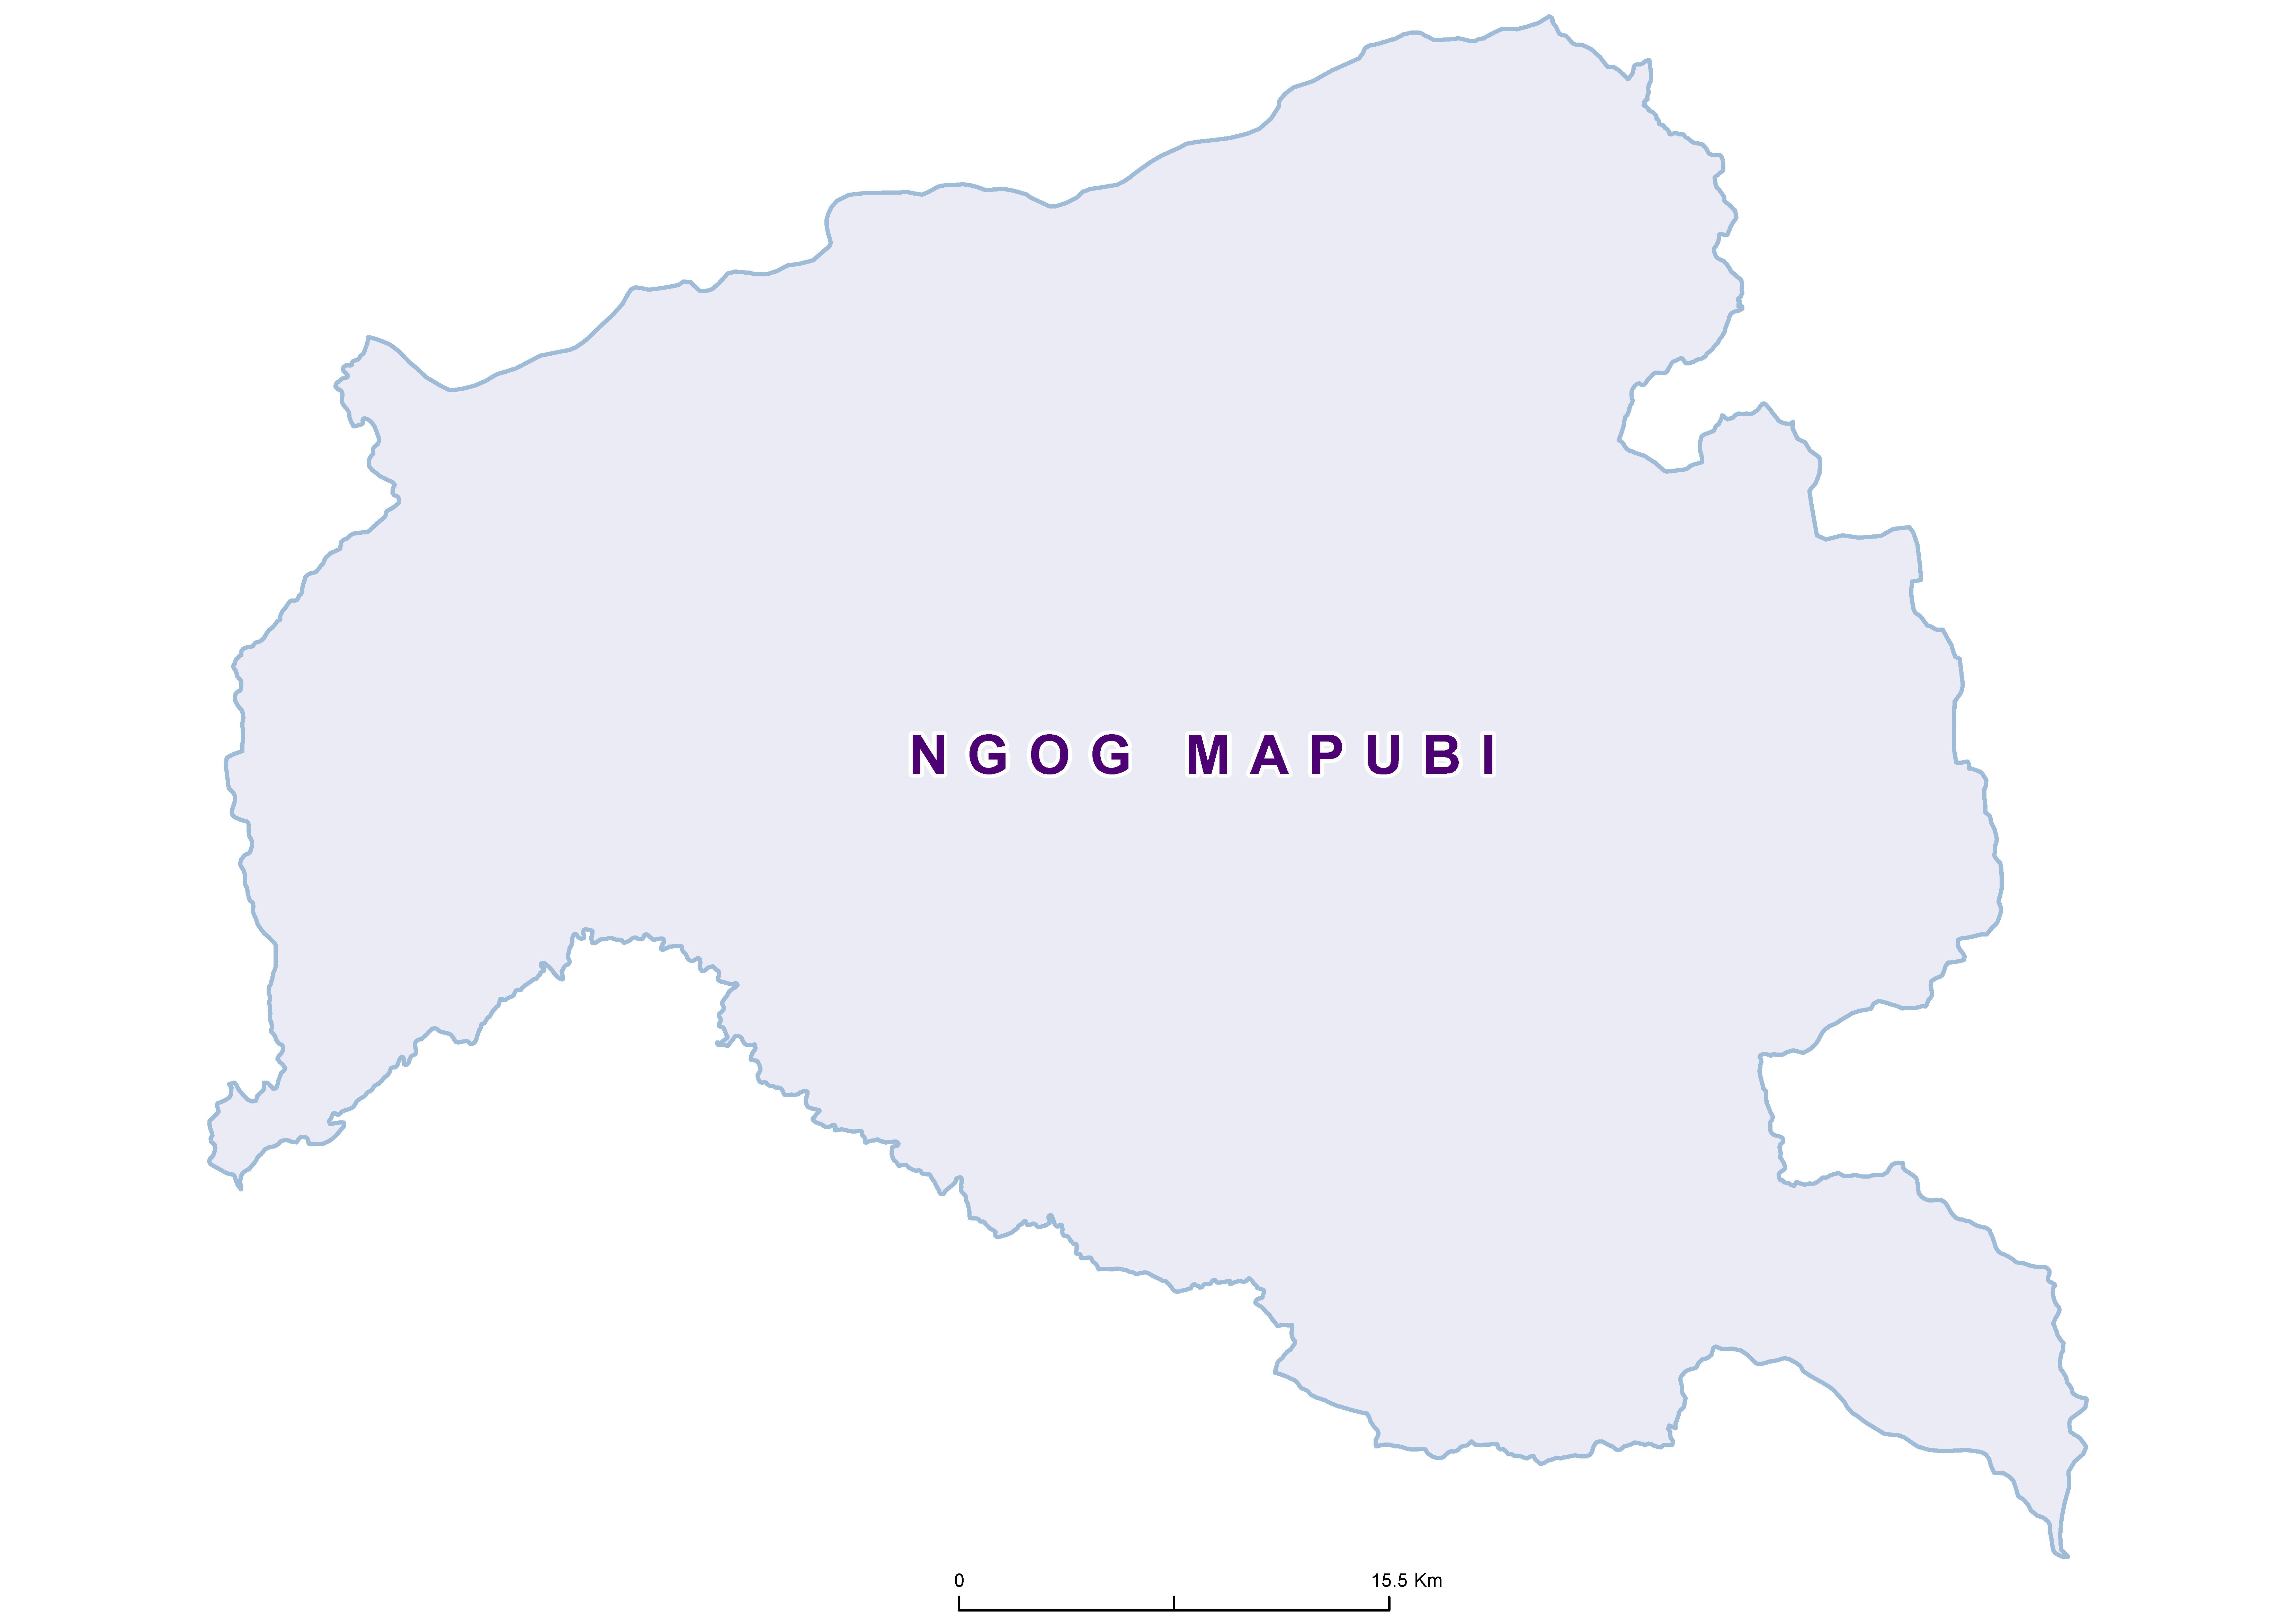 Ngog mapubi Max STH 20180001